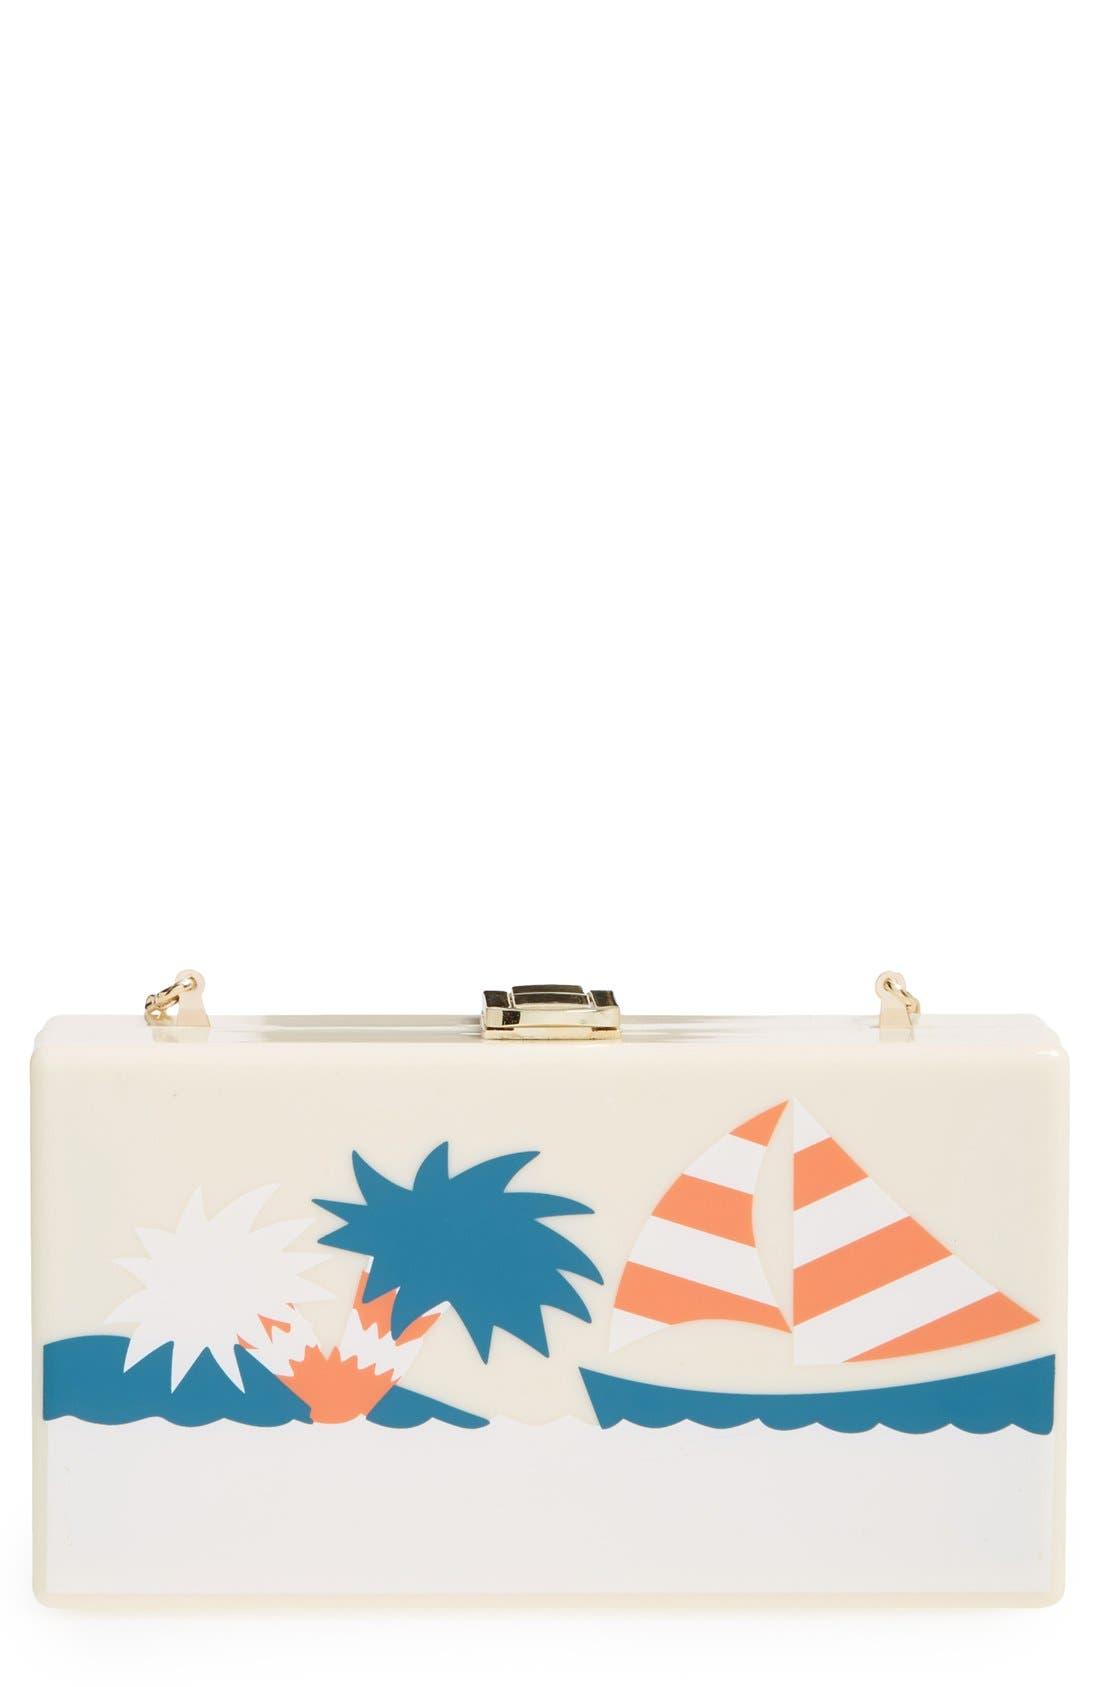 Alternate Image 1 Selected - Natasha Couture 'Island' Clutch